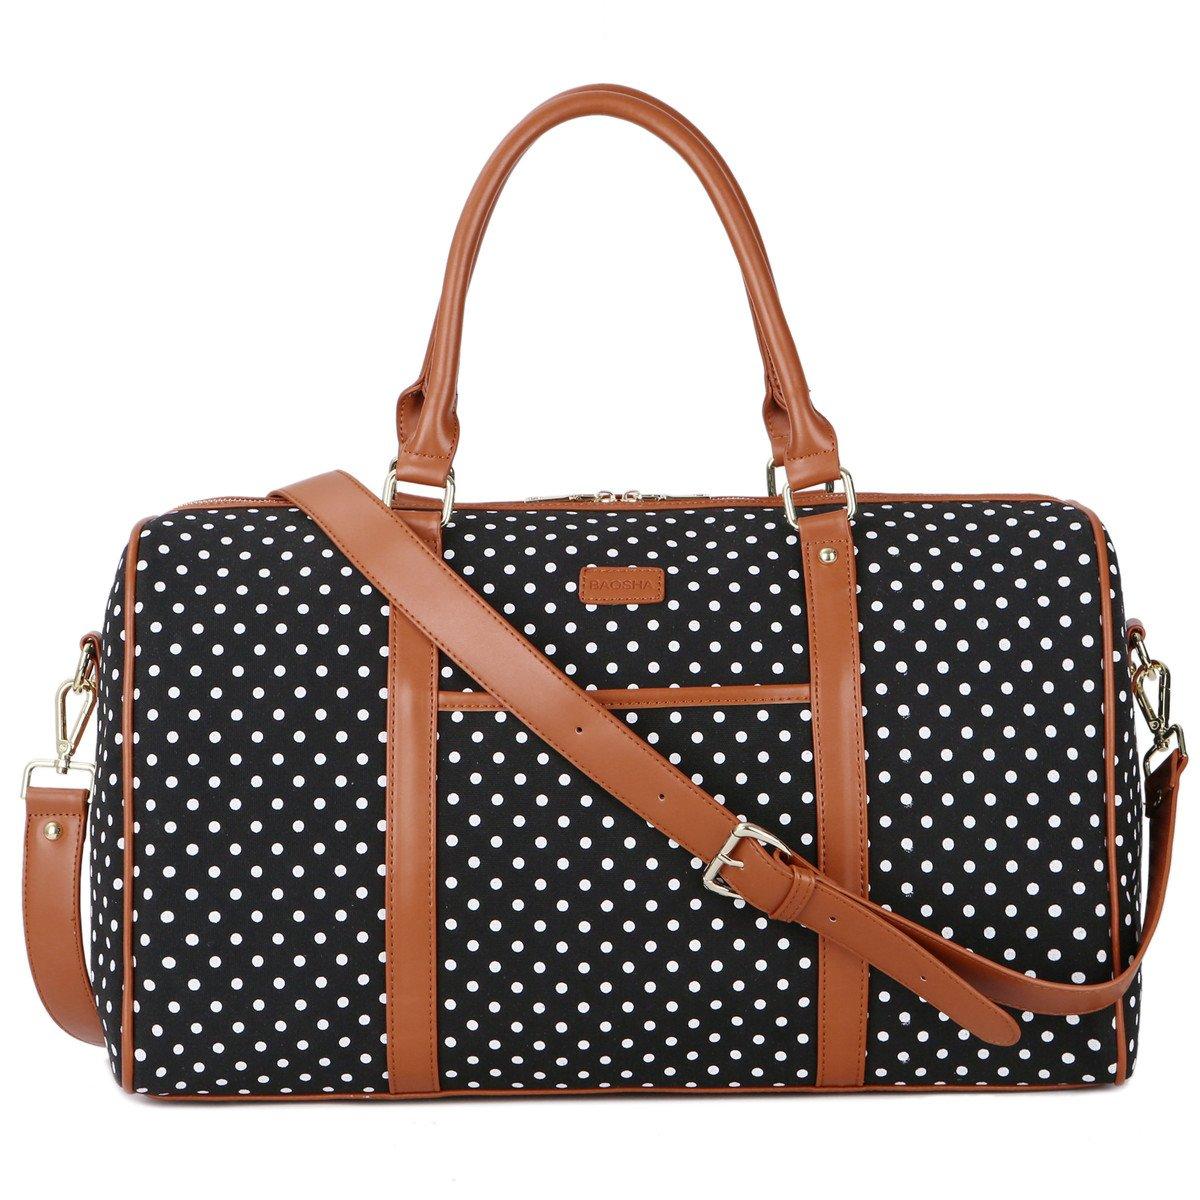 9f70f96a32c2 Cheap Samsonite Weekender Bag, find Samsonite Weekender Bag deals on ...